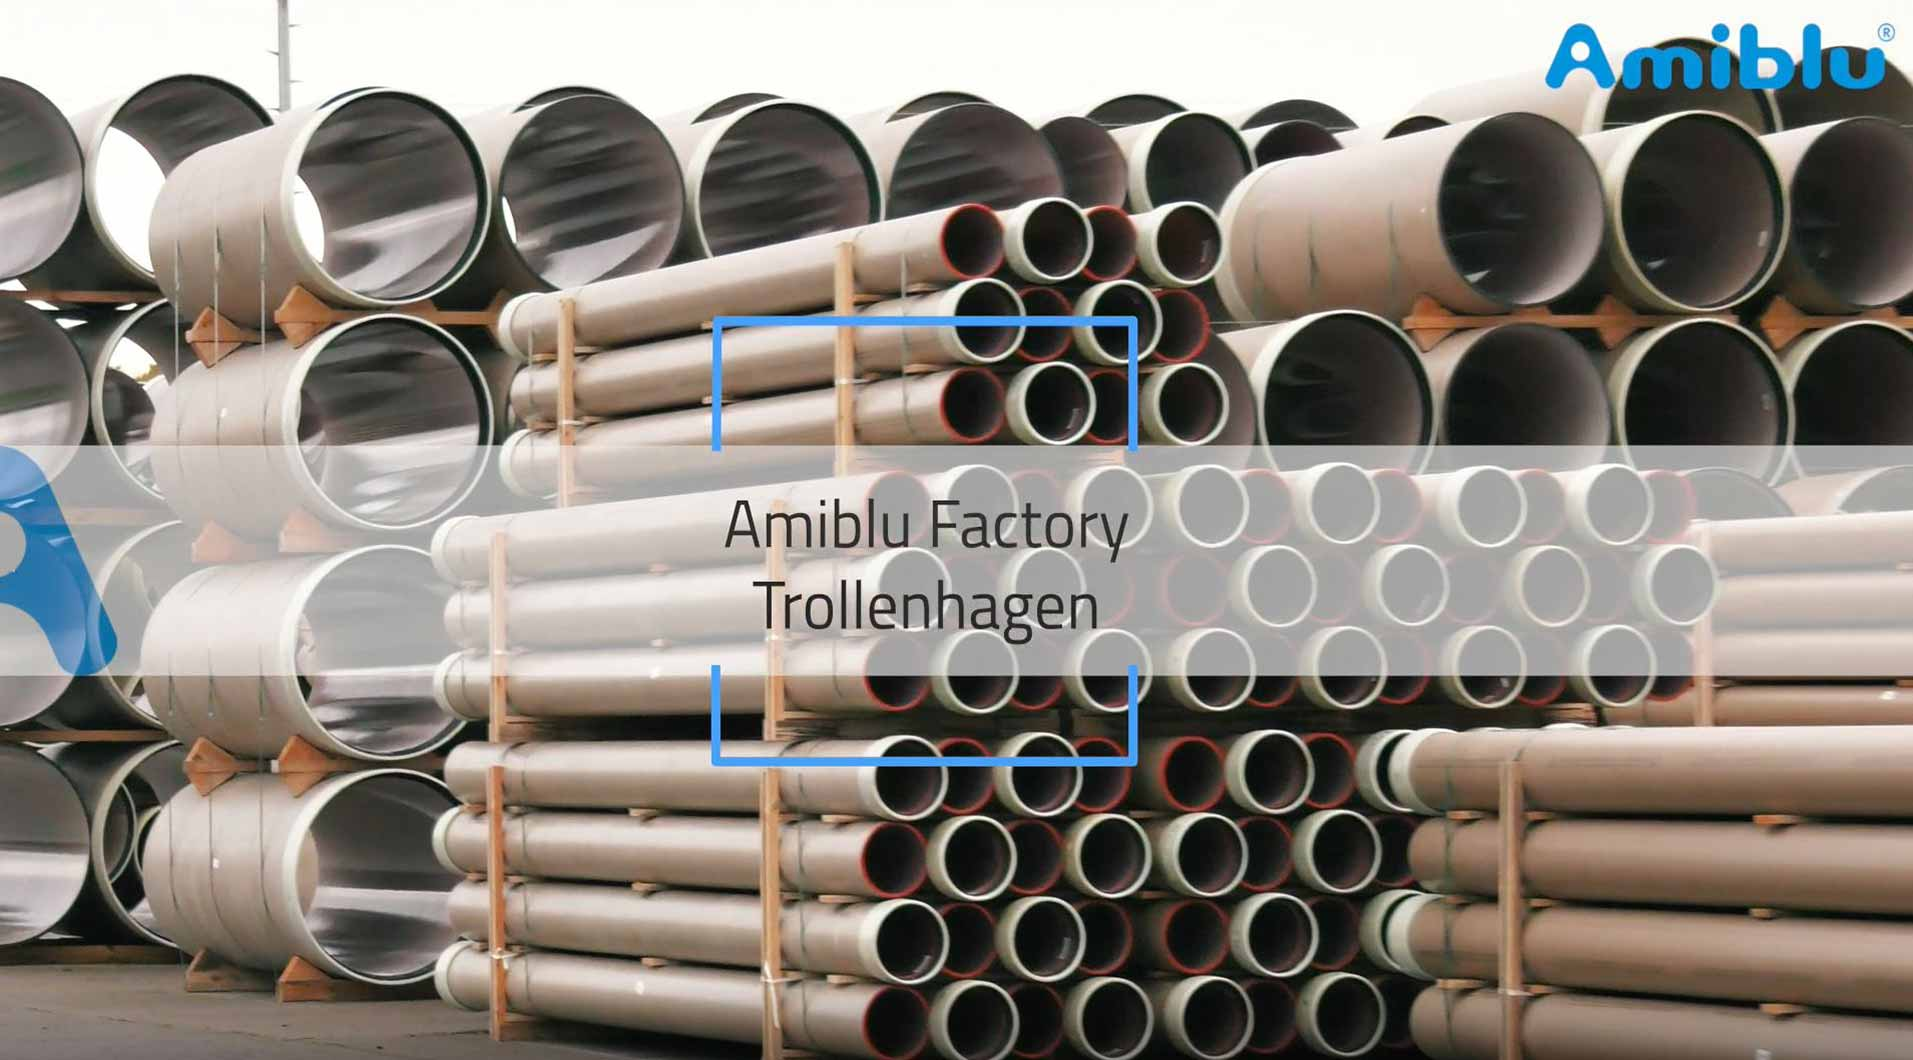 Amiblu Factory Trollenhagen